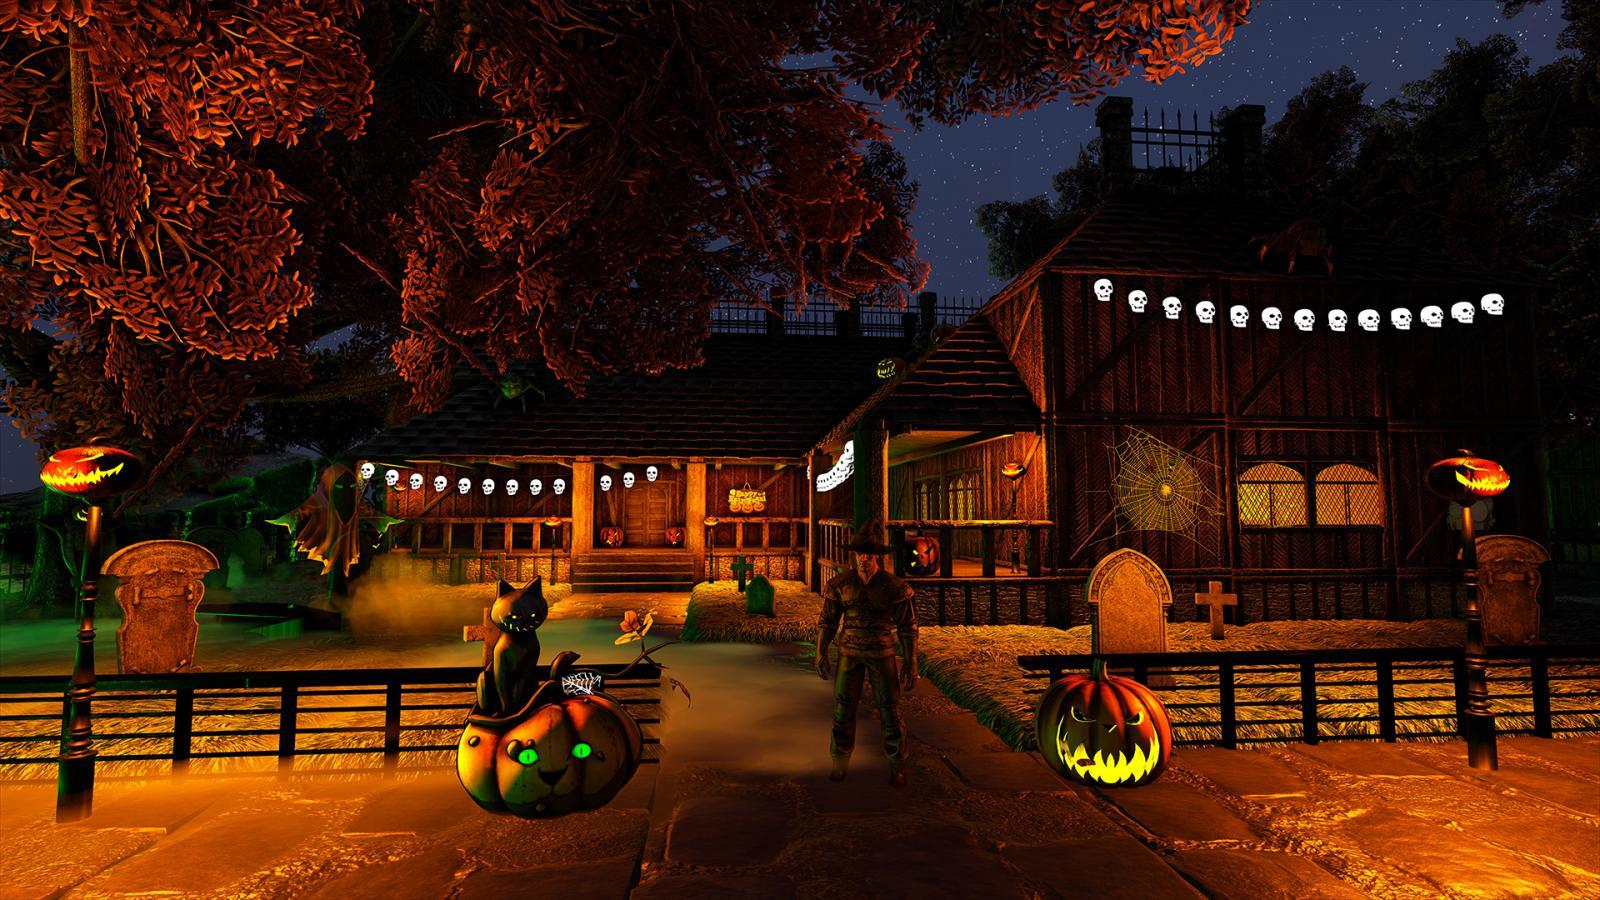 wolf angelus halloween town house 1 night 8xjpg